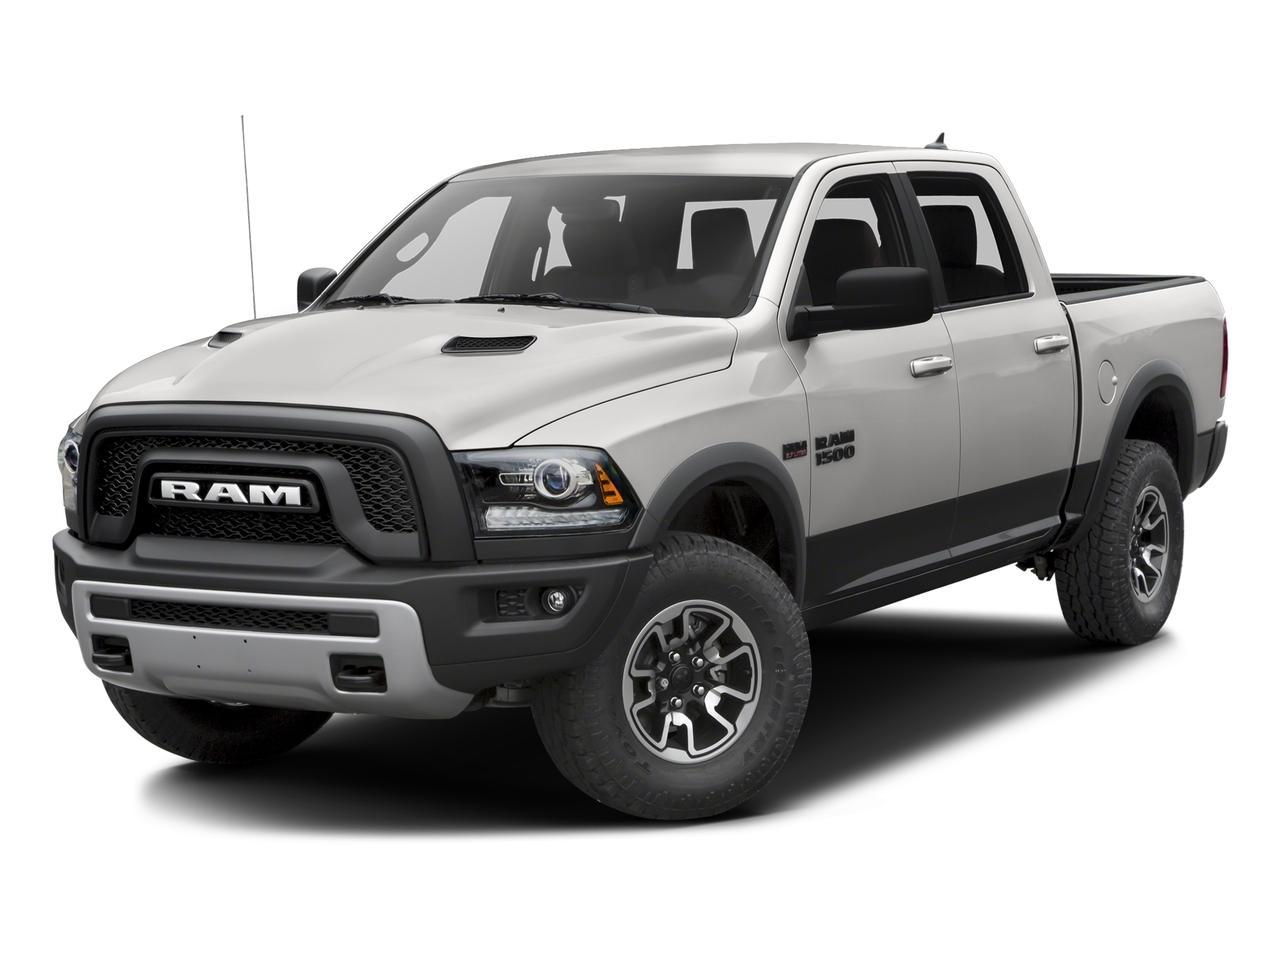 2016 Ram 1500 Vehicle Photo in Portland, OR 97225